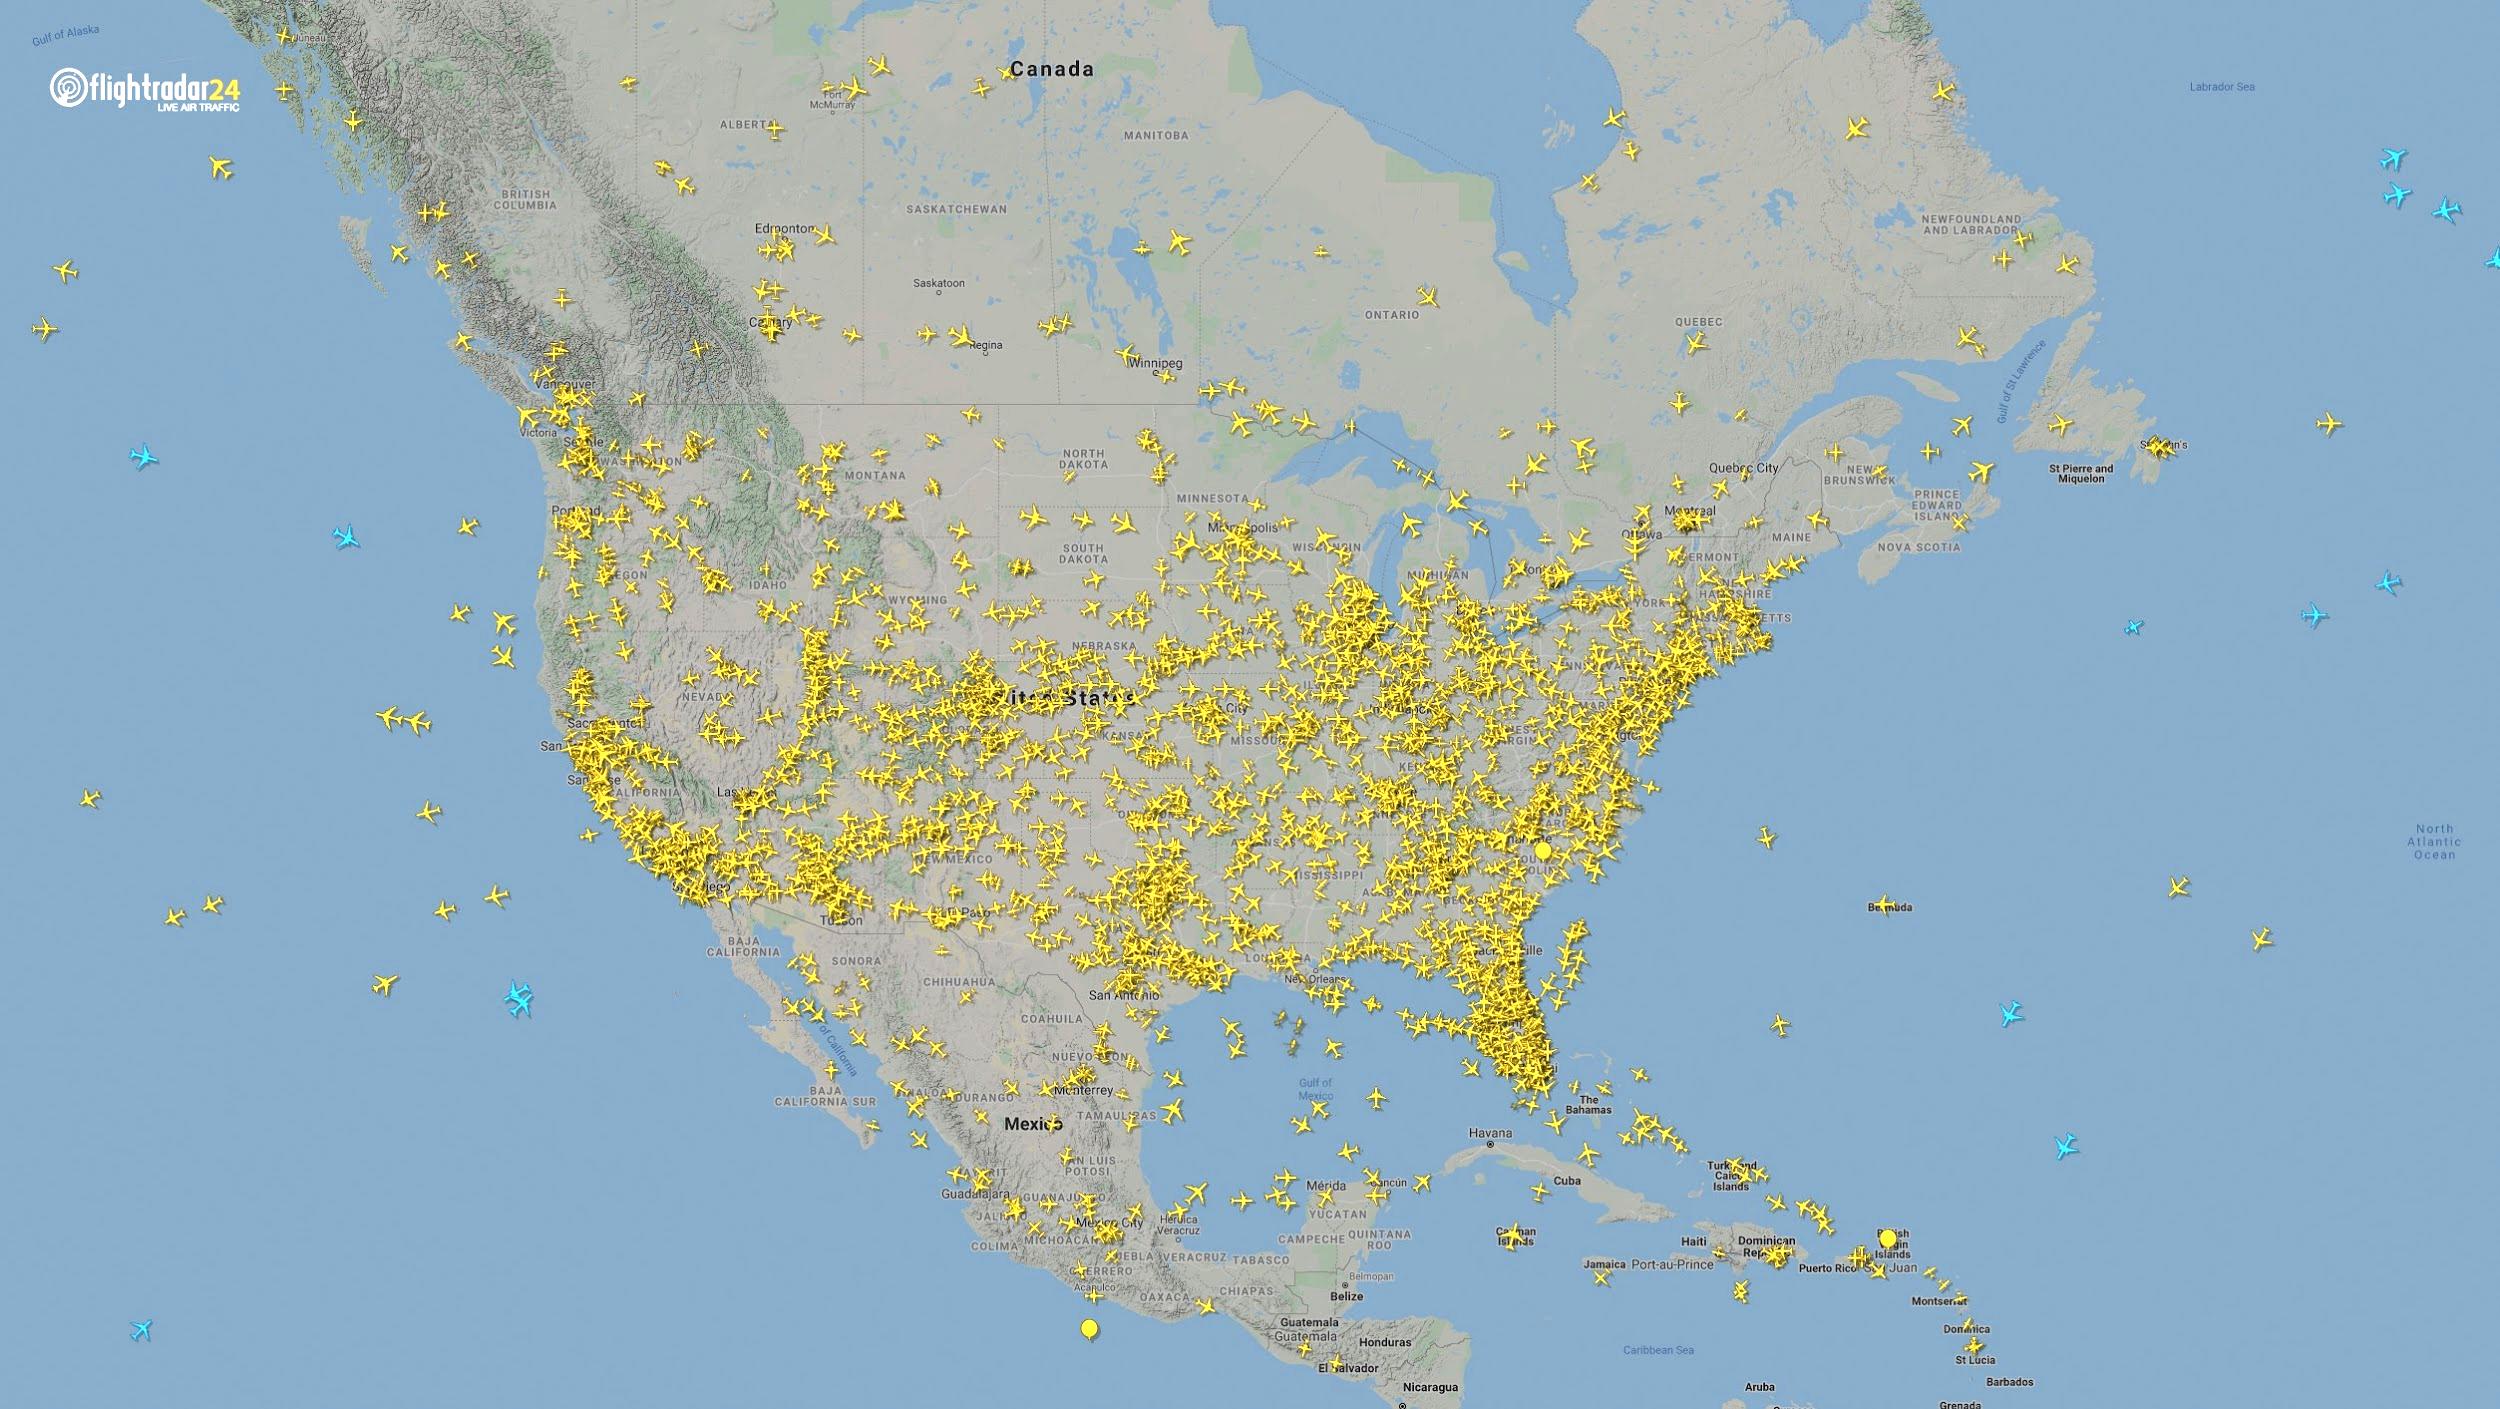 Air traffic over North America April 7, 2020. (Source: Flightradar24)